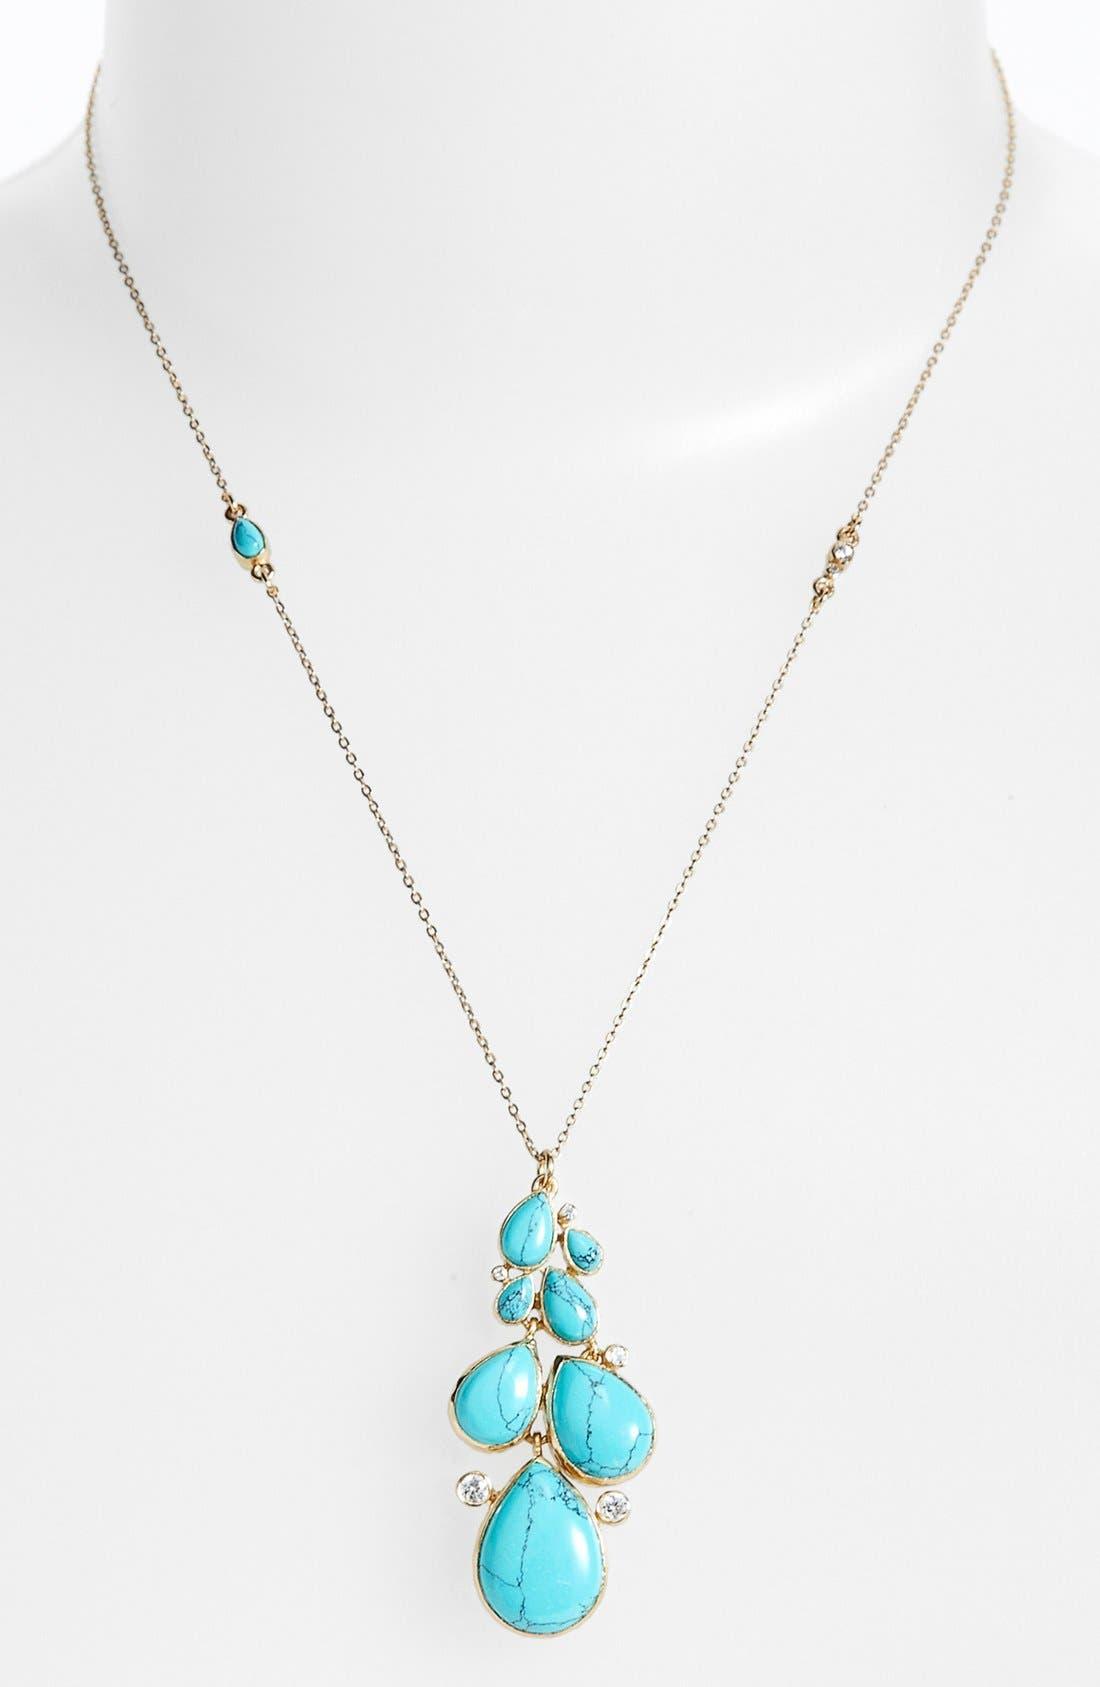 Alternate Image 1 Selected - Melinda Maria 'Regan' Pendant Necklace (Nordstrom Exclusive)